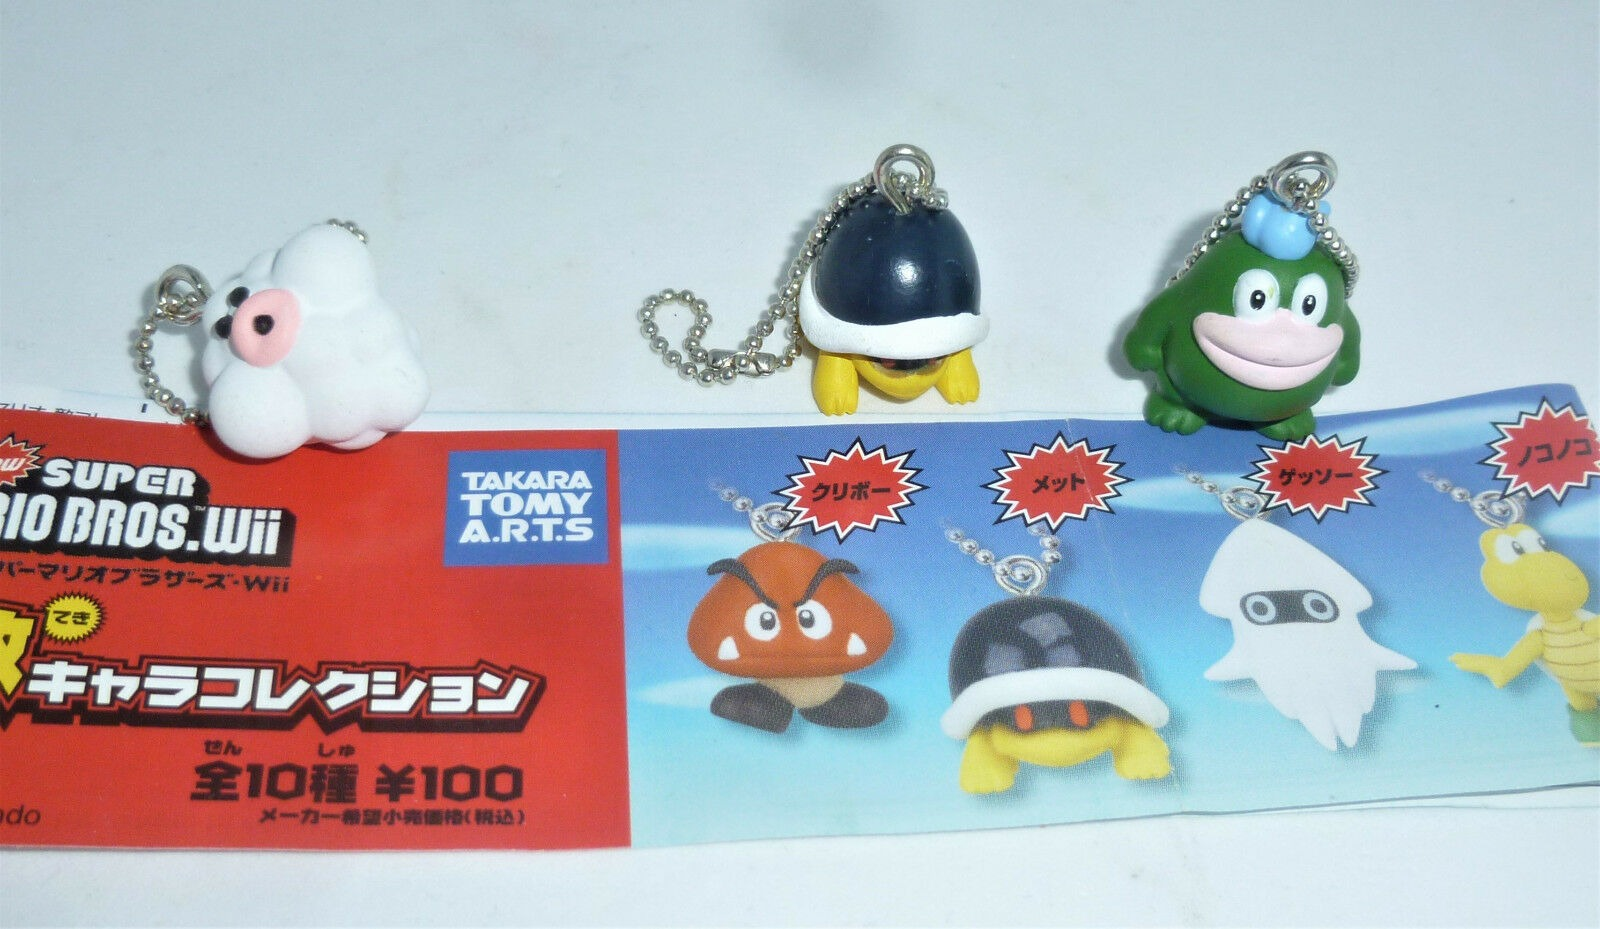 New Super Mario Bros Wii Anhänger